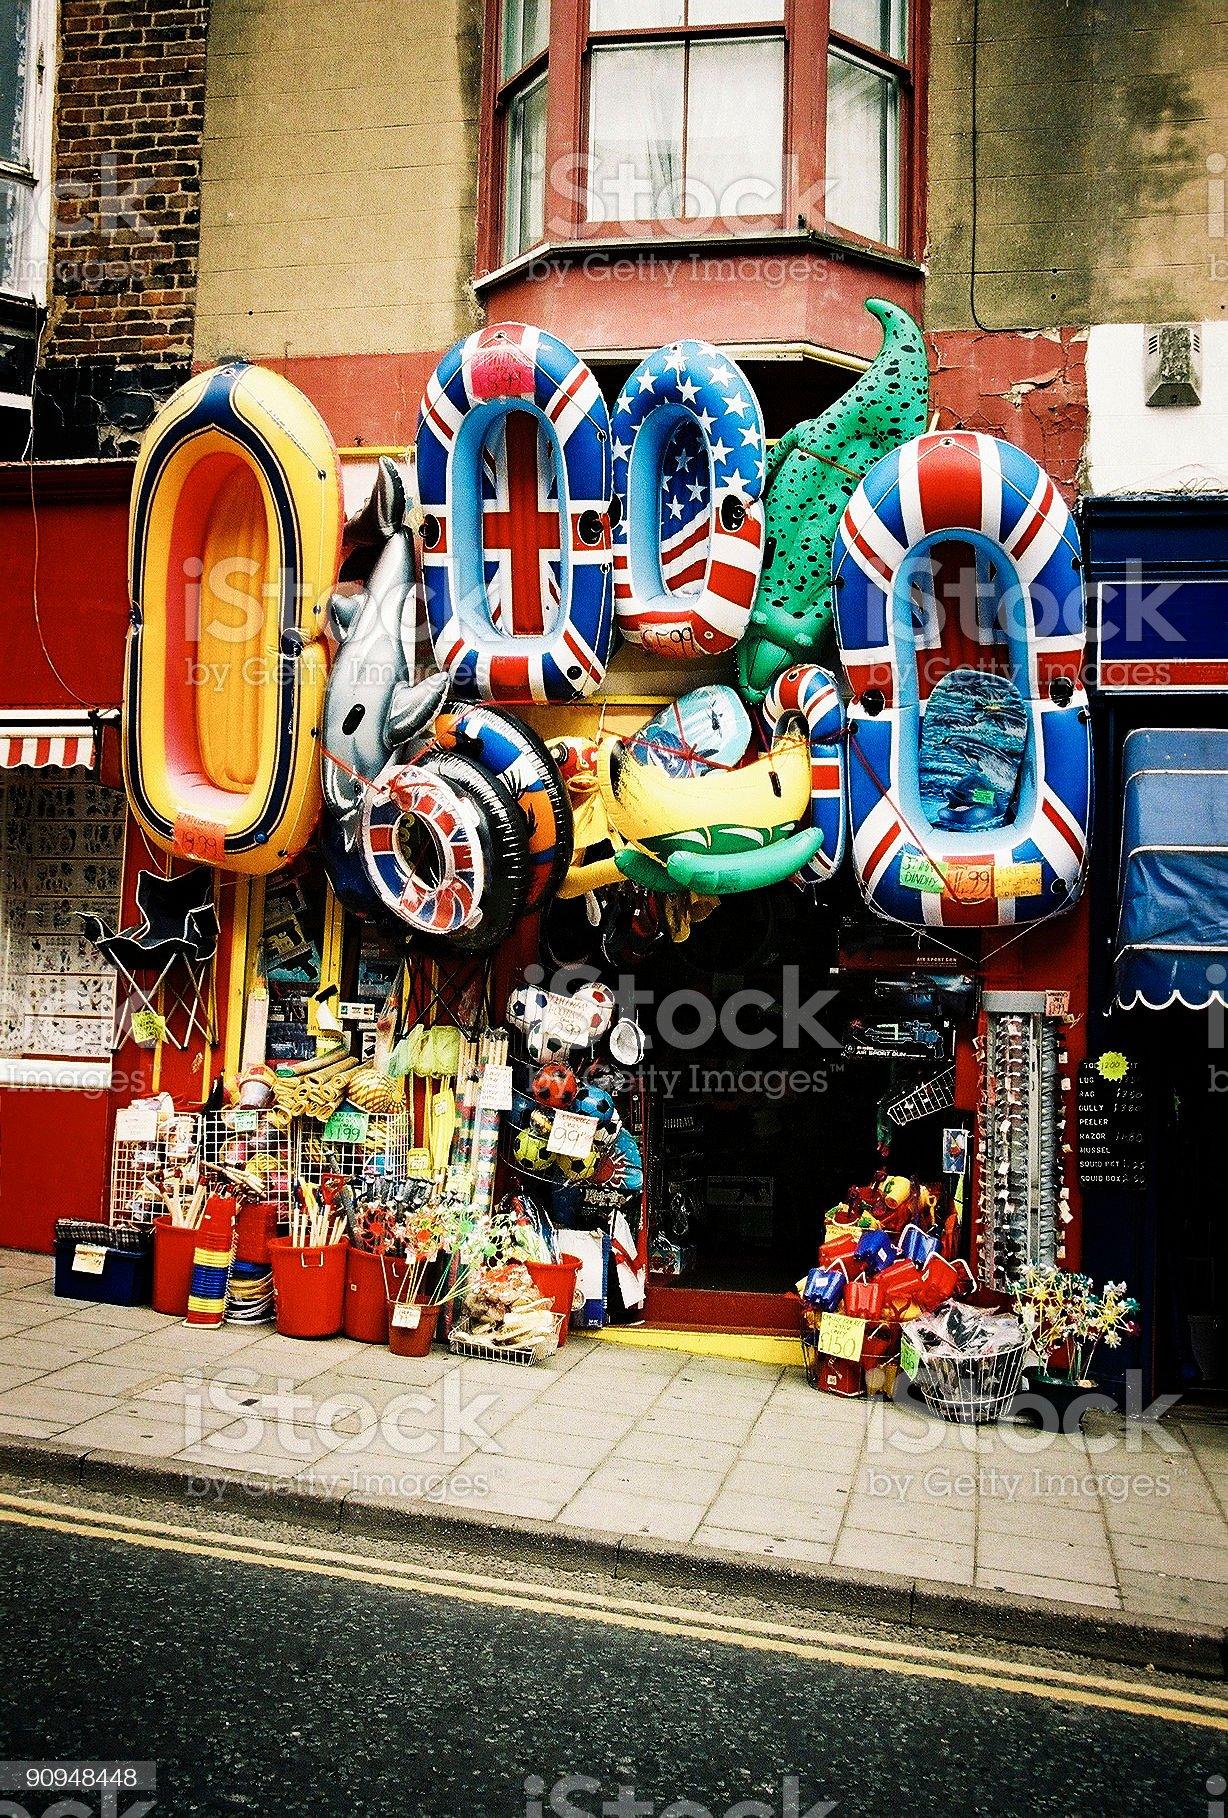 English Seaside Shop royalty-free stock photo